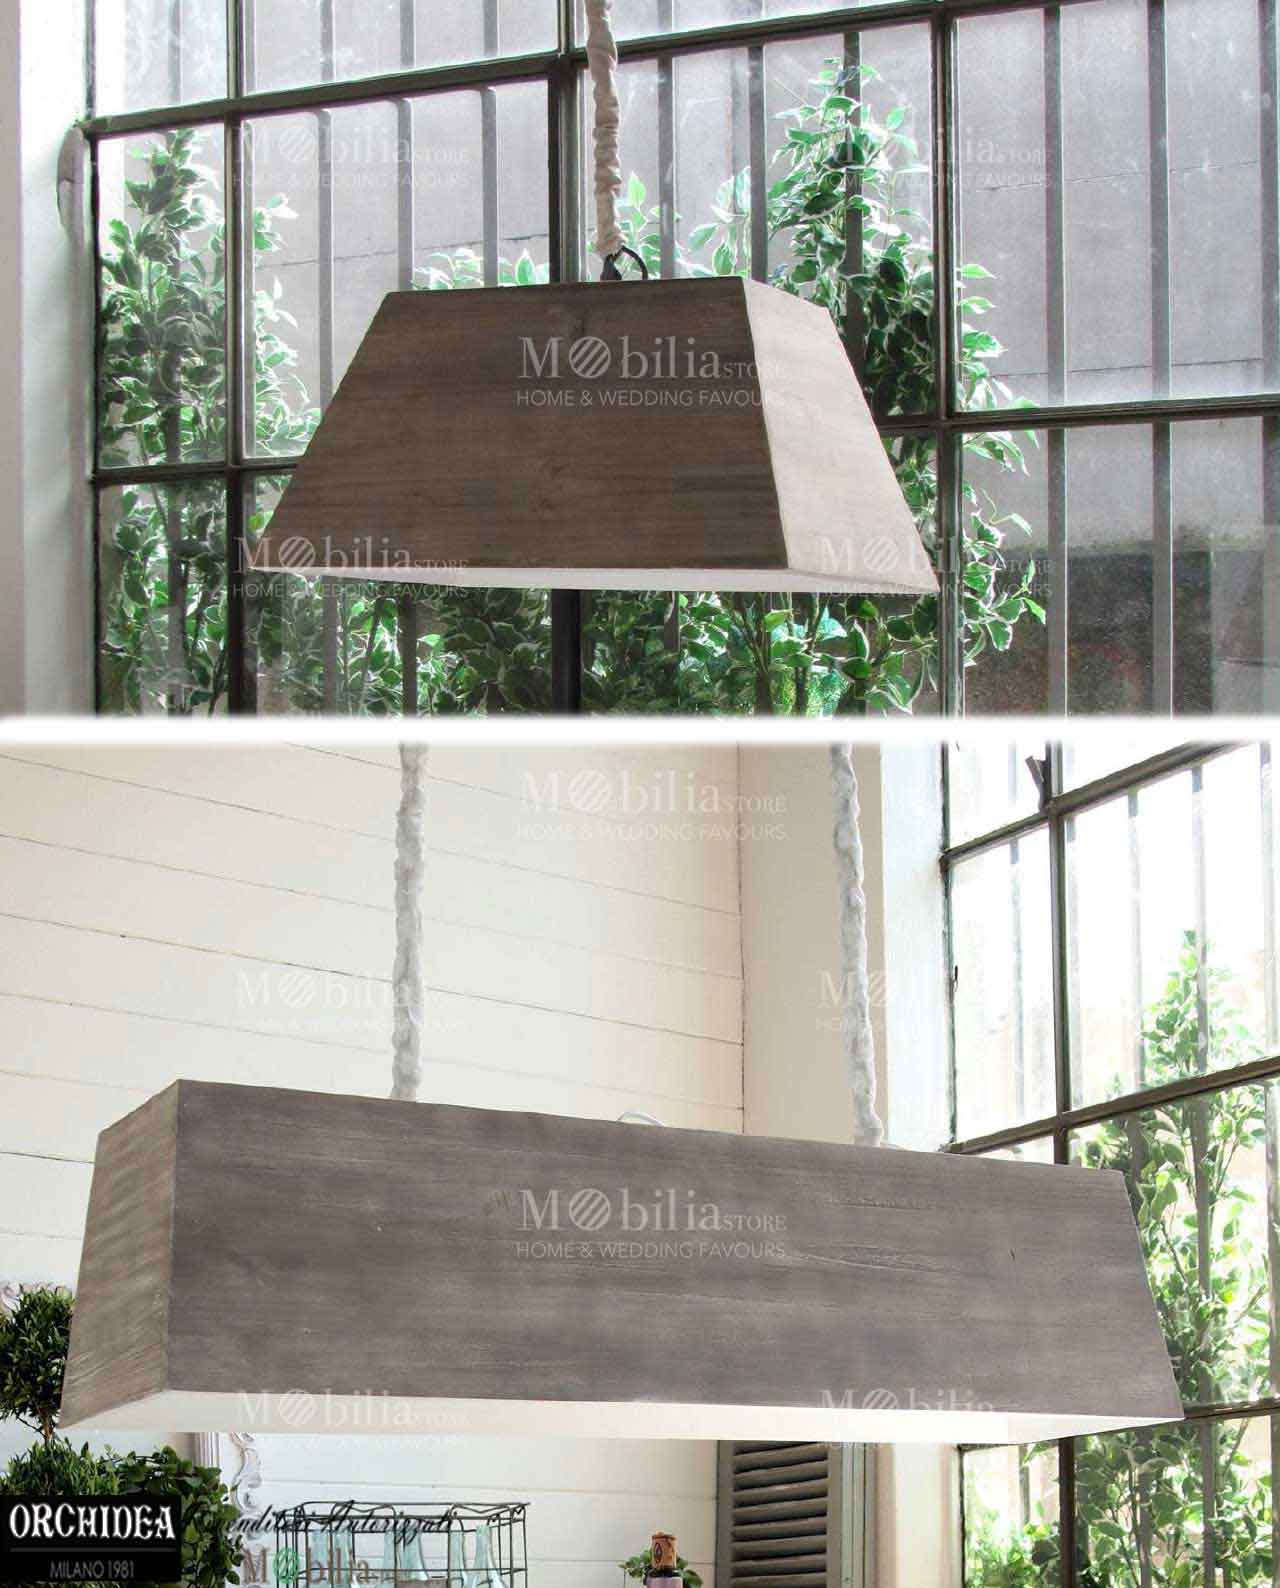 lampadario country : ... Shop / Idea Regalo / Casa / Lampadario sospensione legno stile country